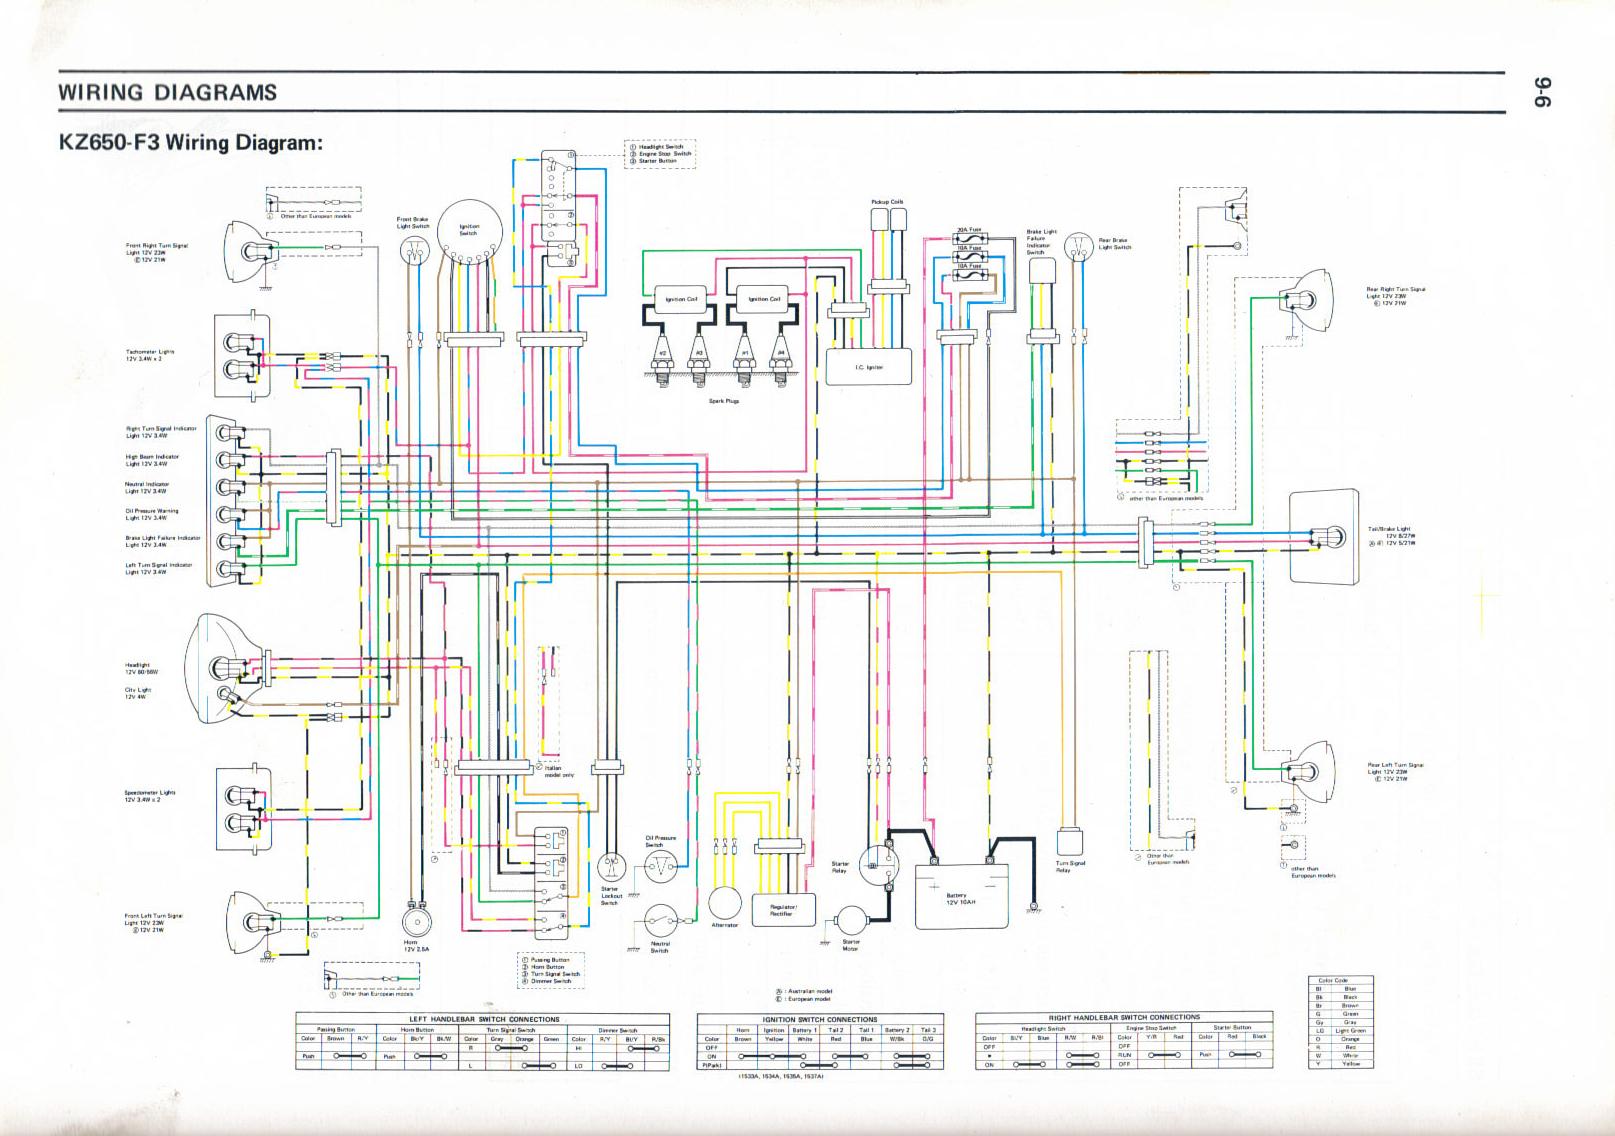 bobber kz650 wiring diagram wiring diagrambobber kz650 wiring diagram best wiring library1981 kz650 wiring diagram simple wiring diagrams klr650 wiring diagram